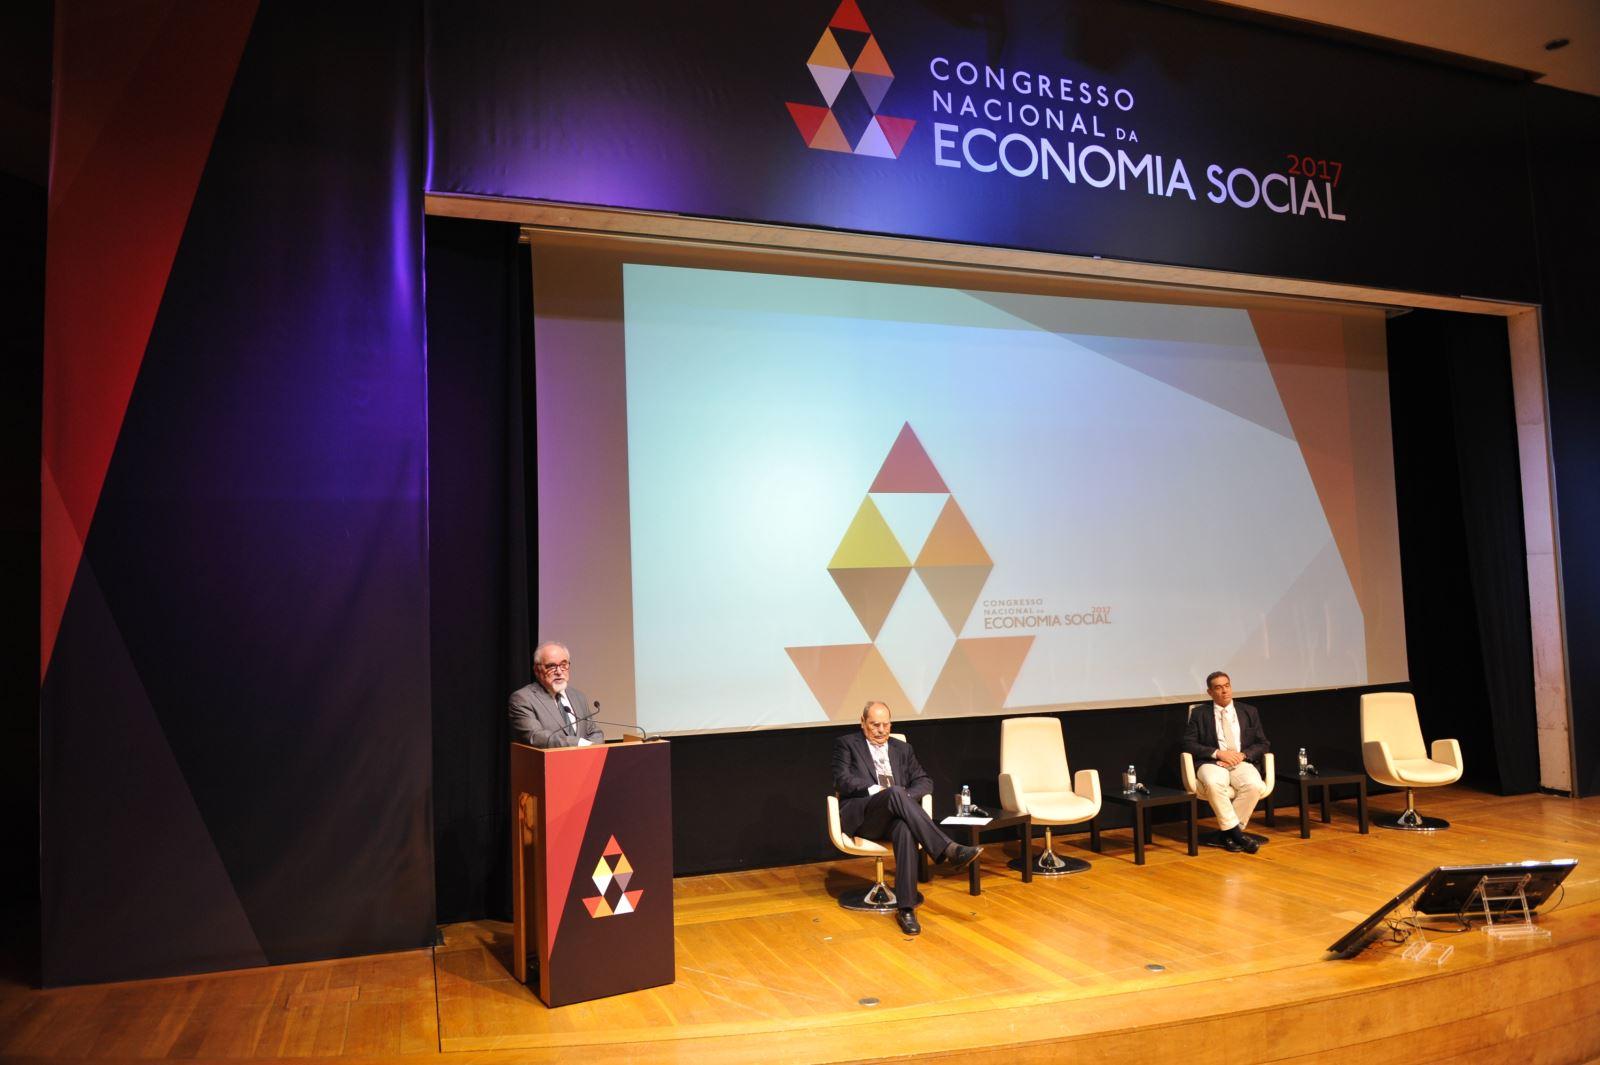 Economia Social | Congresso Nacional